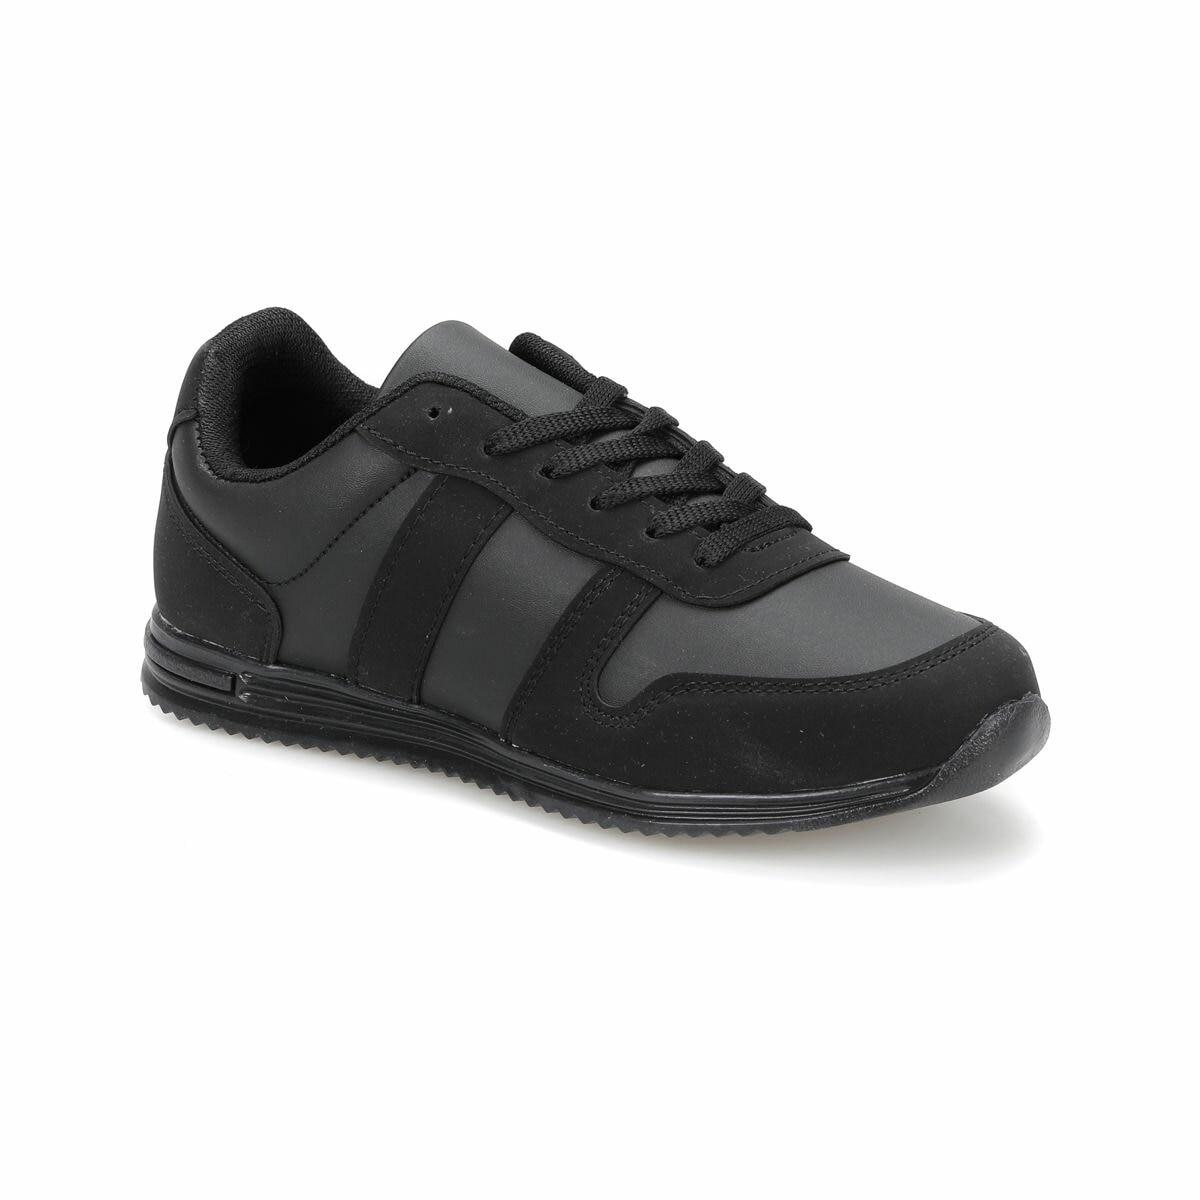 FLO BRIAN PU W Black Women 'S Sneaker Shoes Torex